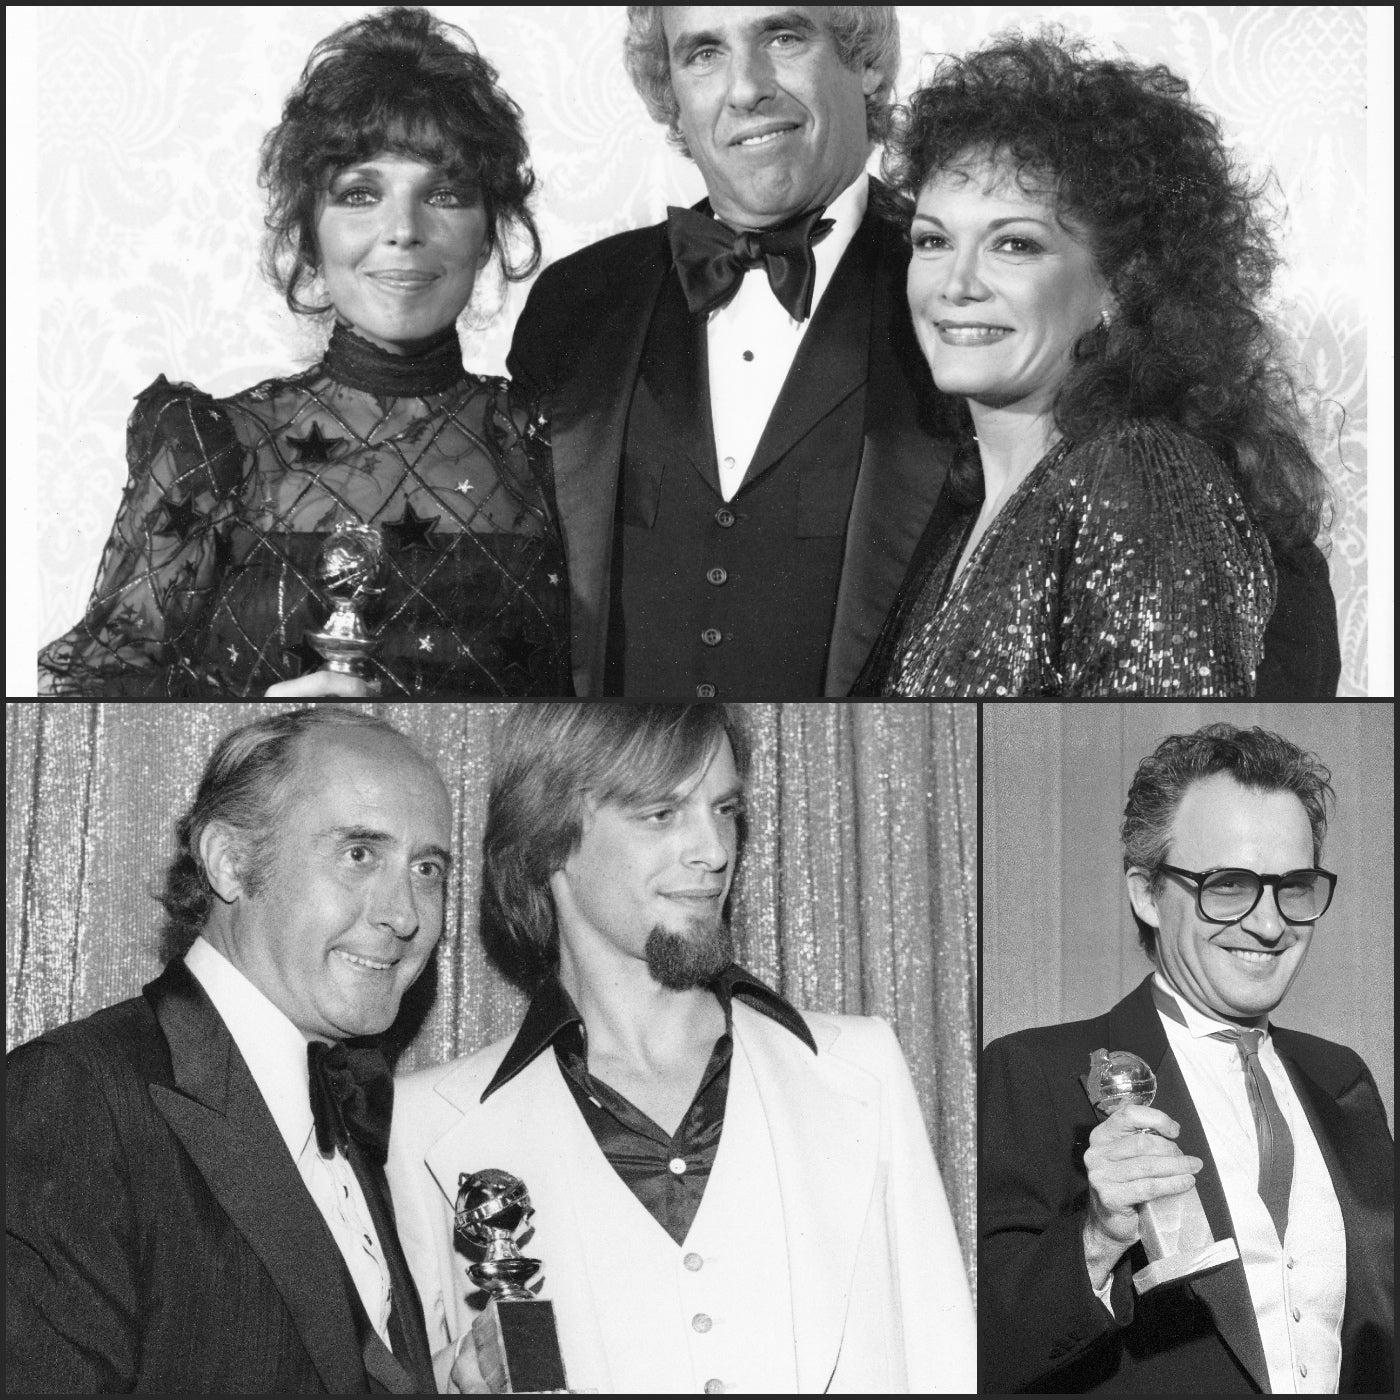 Burt Baccarach, Carole Bayer Sager, Keith Carradine, Henry Mancini, Giorgio Moroder